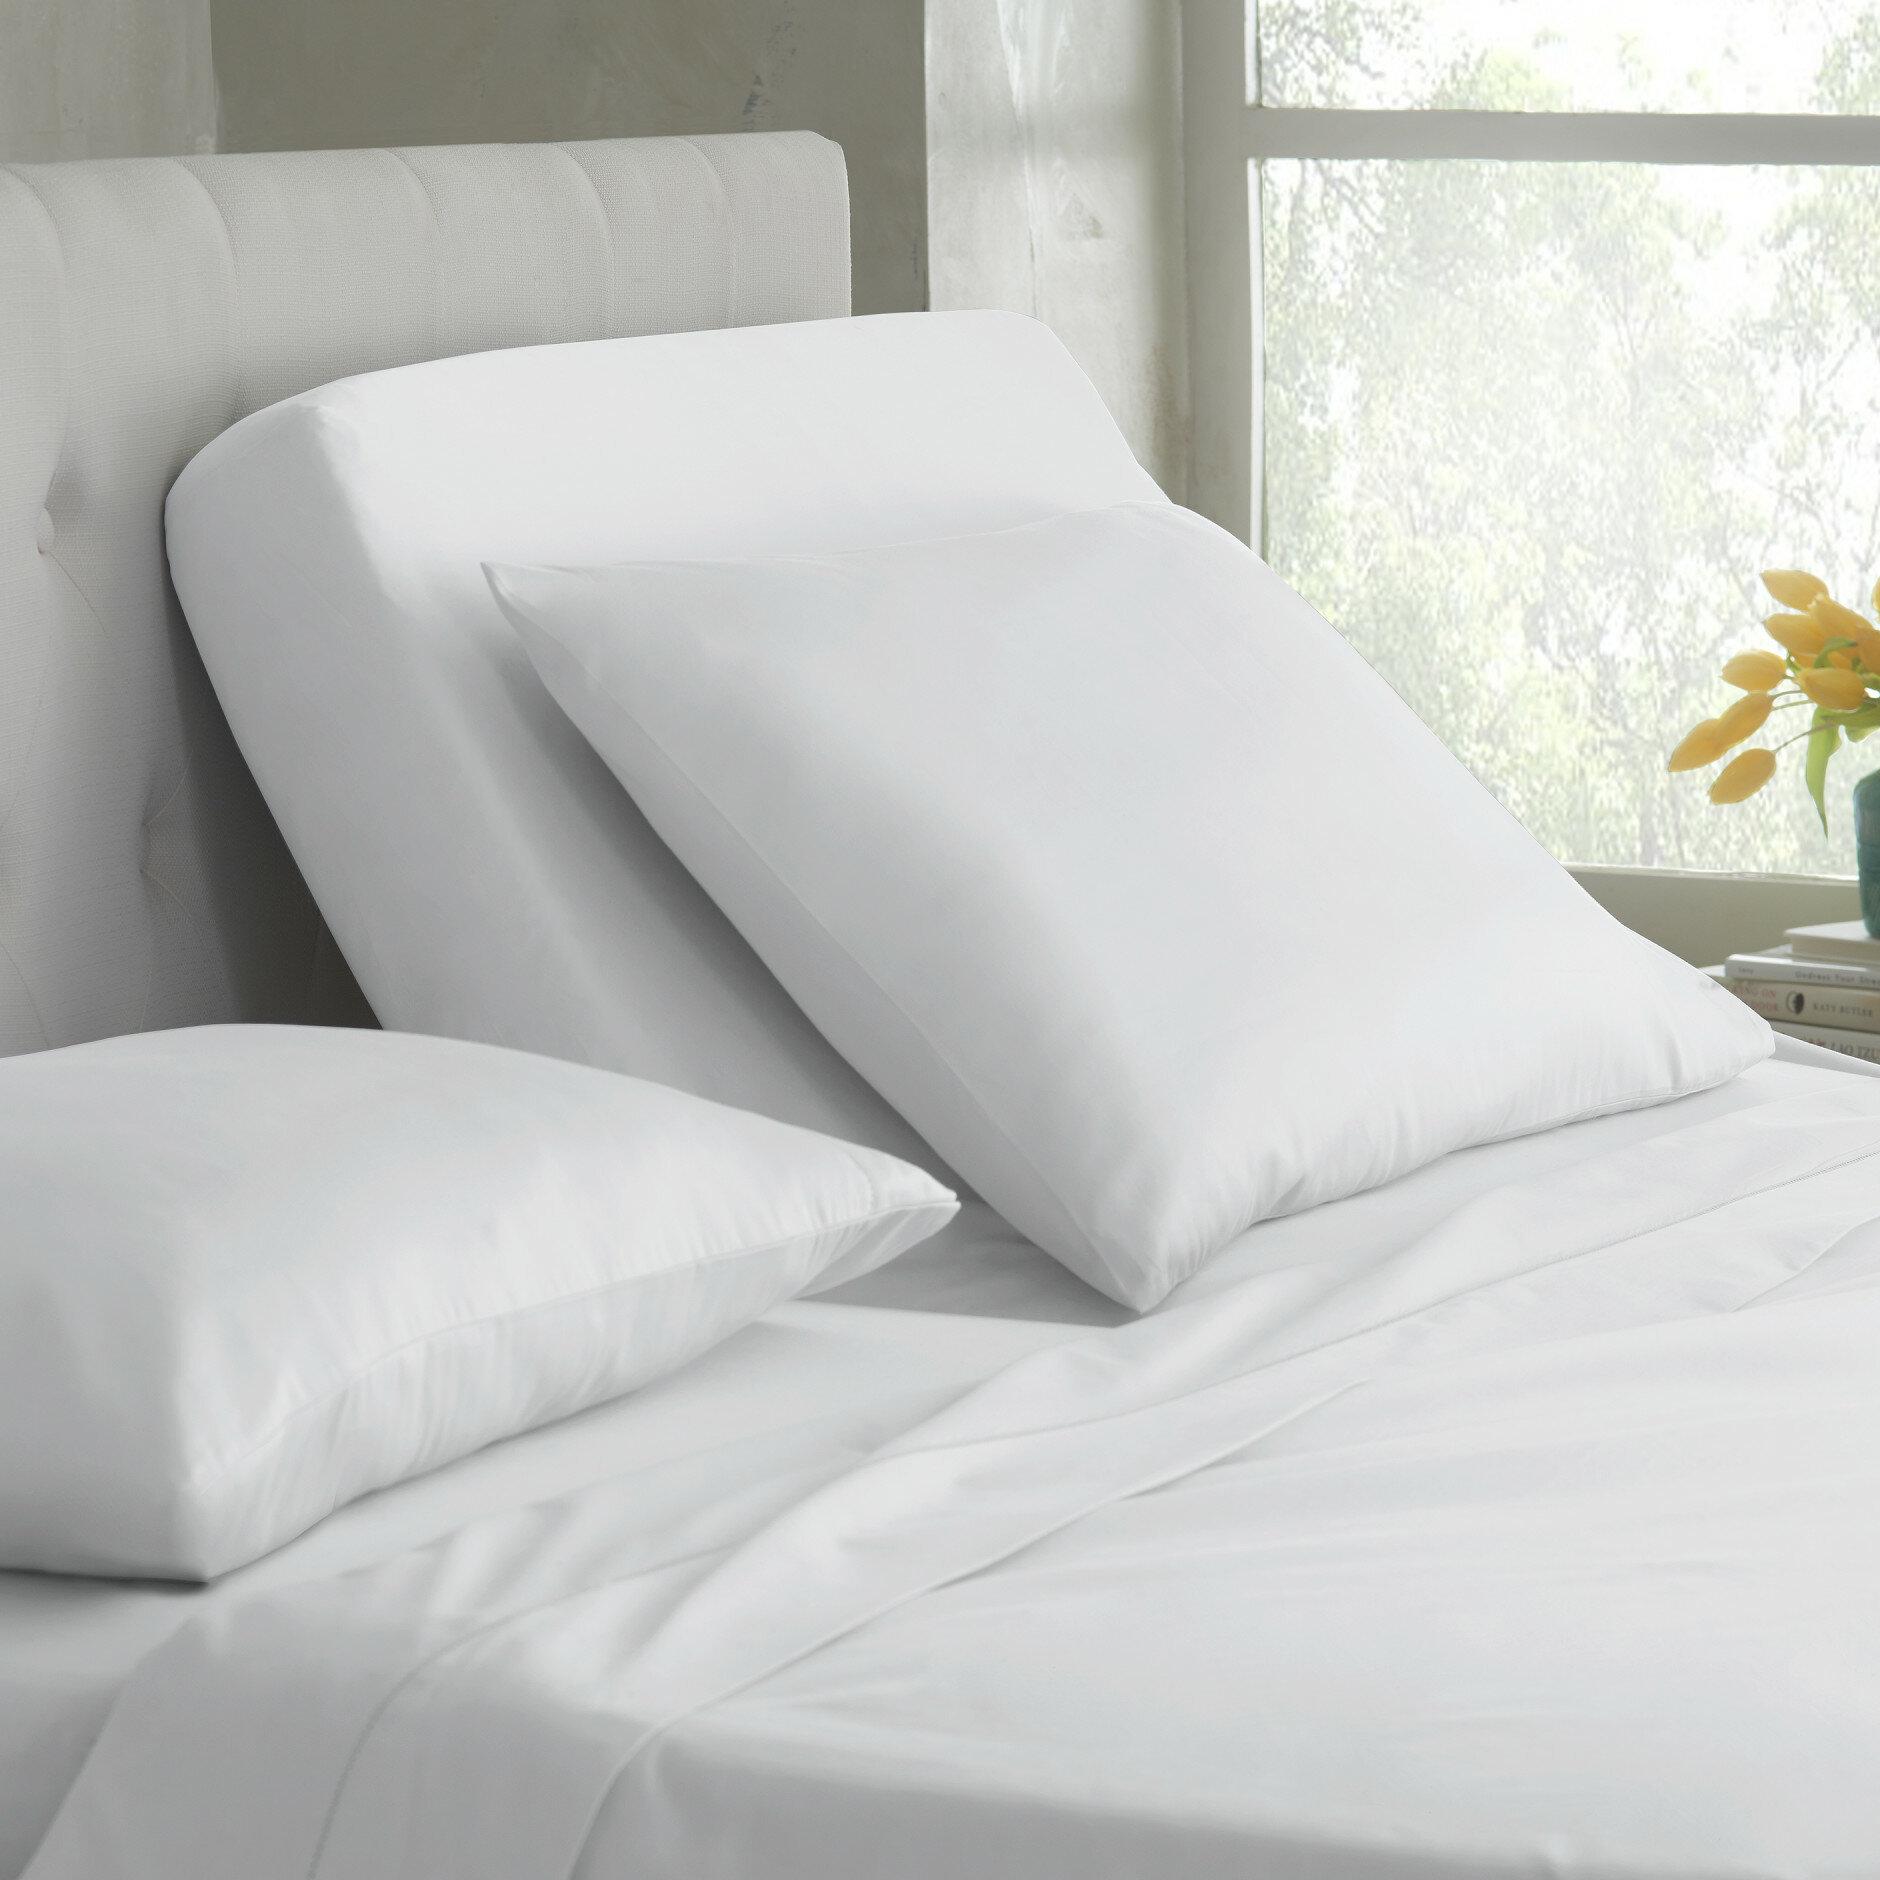 Martex Split King White 400 Thread Count Cotton Blend Sheet Set Reviews Wayfair